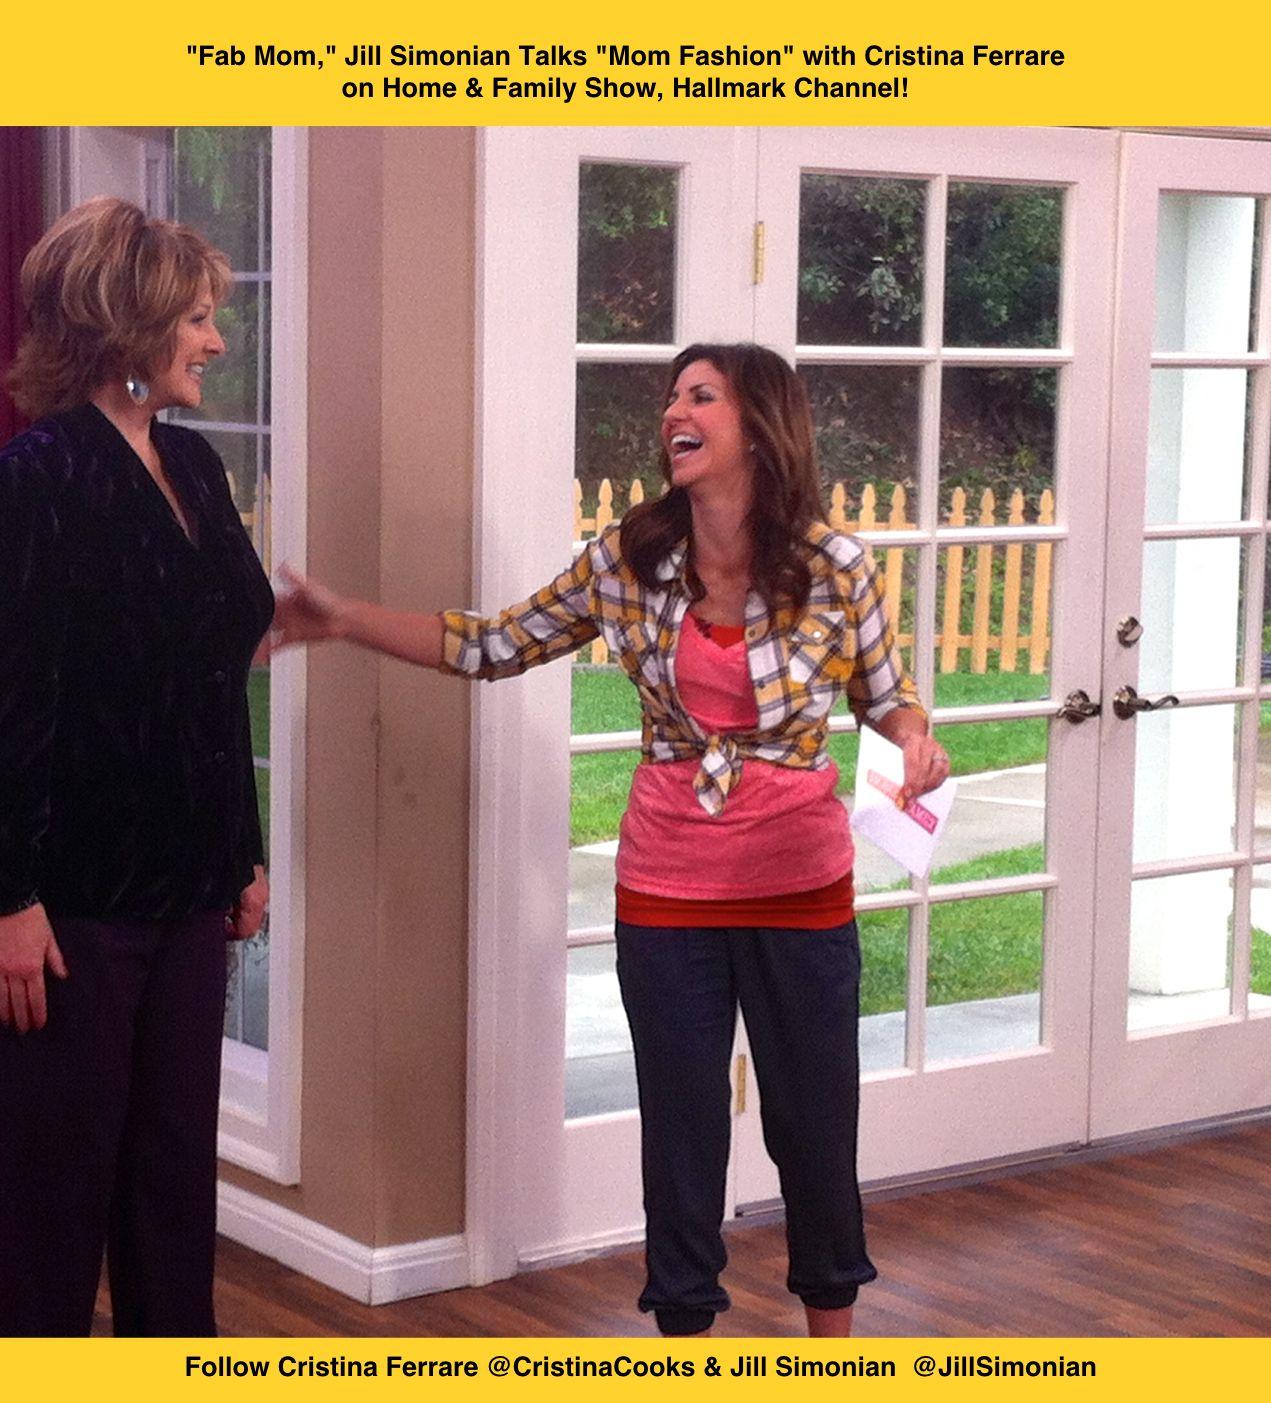 Christina ferrare hairstyle products used -  Fab Mom Jill Simonian With Cristina Ferrare On Home